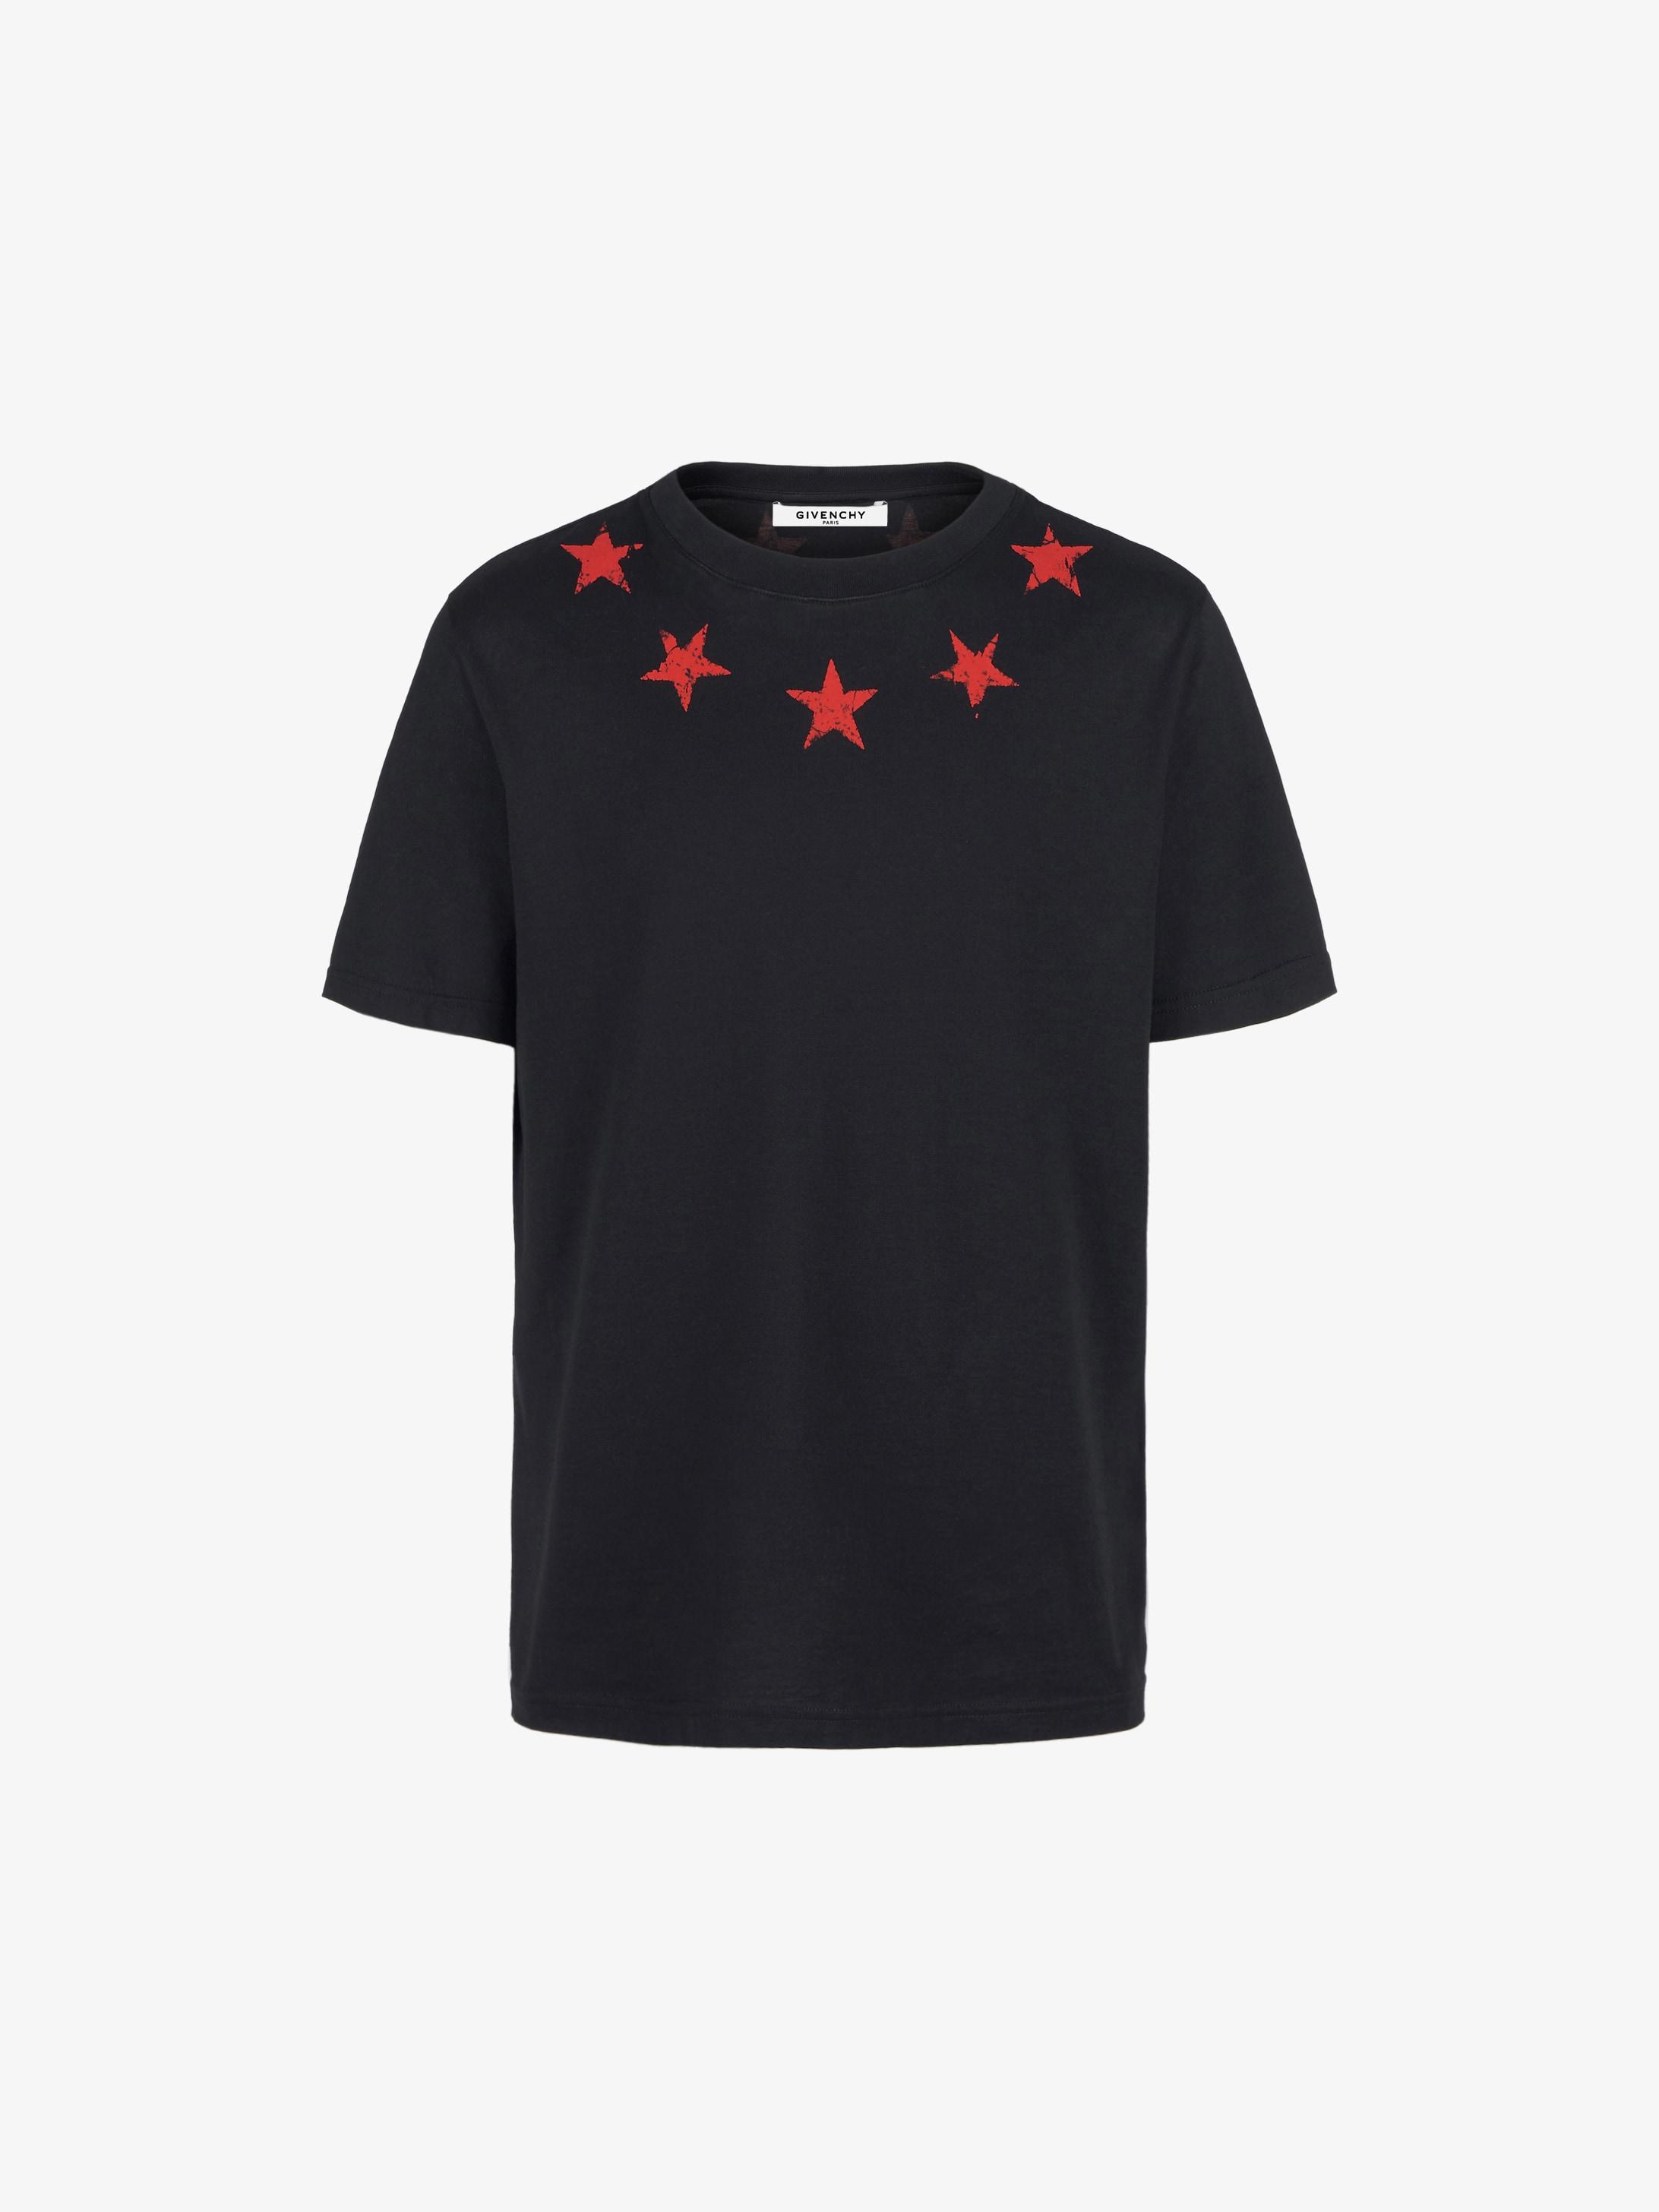 Vintage stars around the neck oversized T-shirt